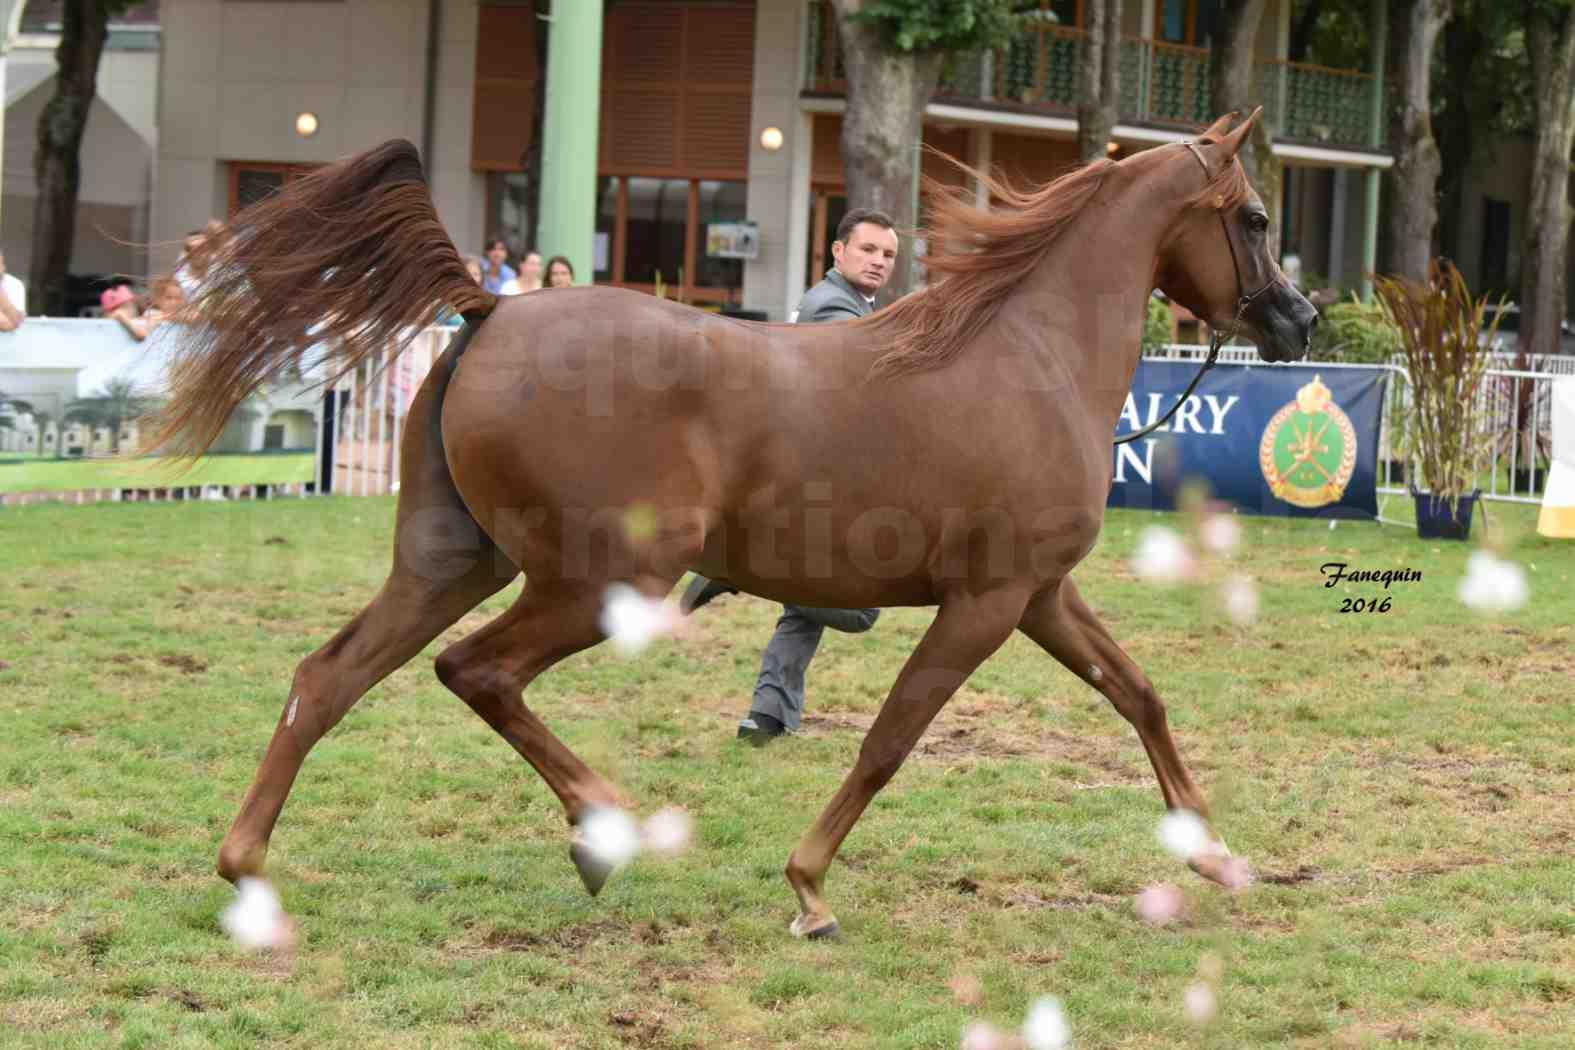 International Arabian Horse Show B de VICHY 2016 - PEARL DE DJOON - Notre Sélection - 16